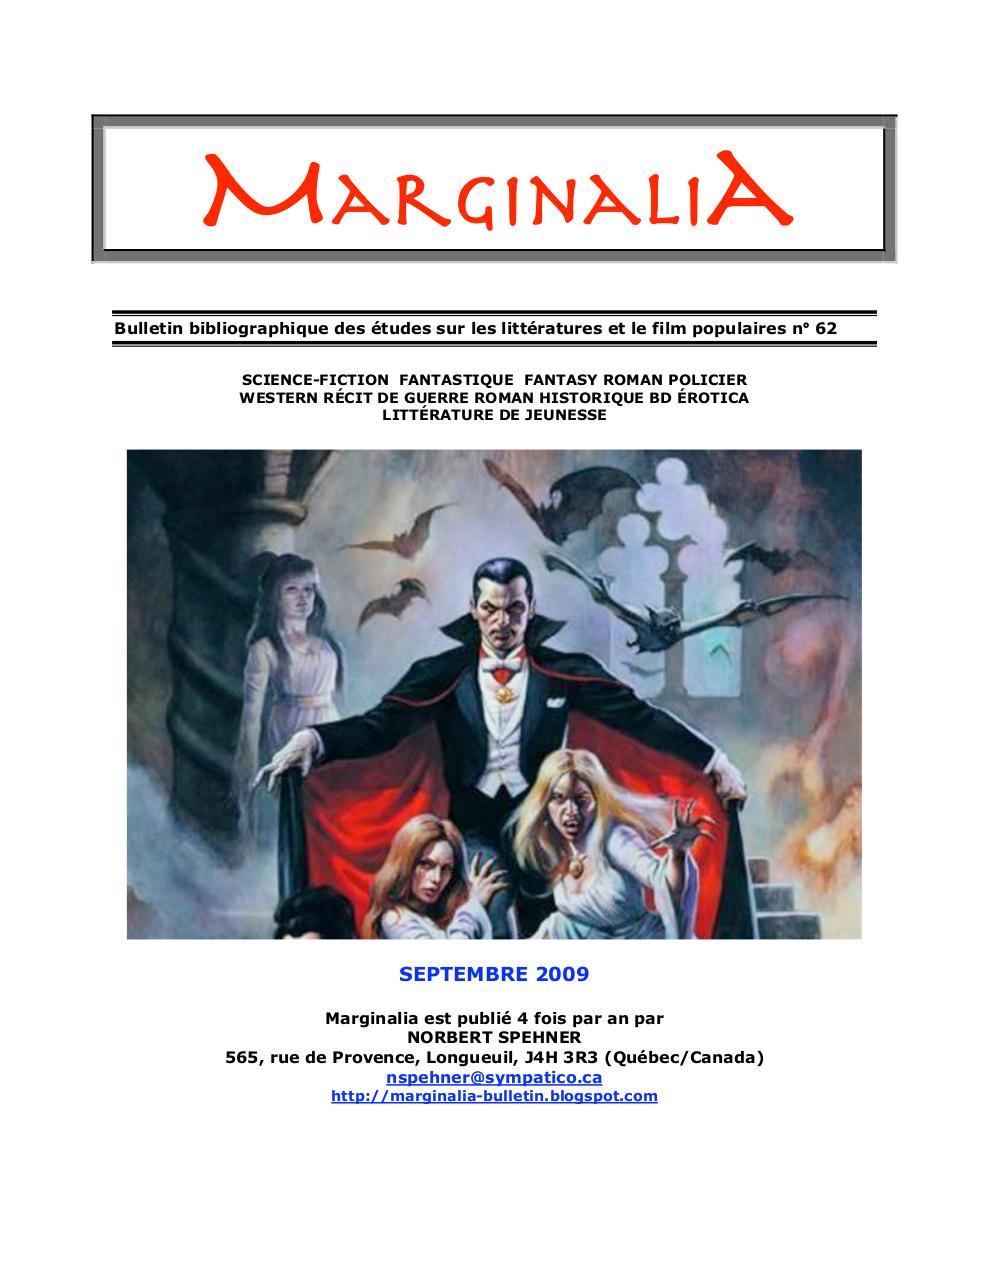 Marginalia62doc Par Norbert Spehner Marginalia62 Pdf Fichier Pdf